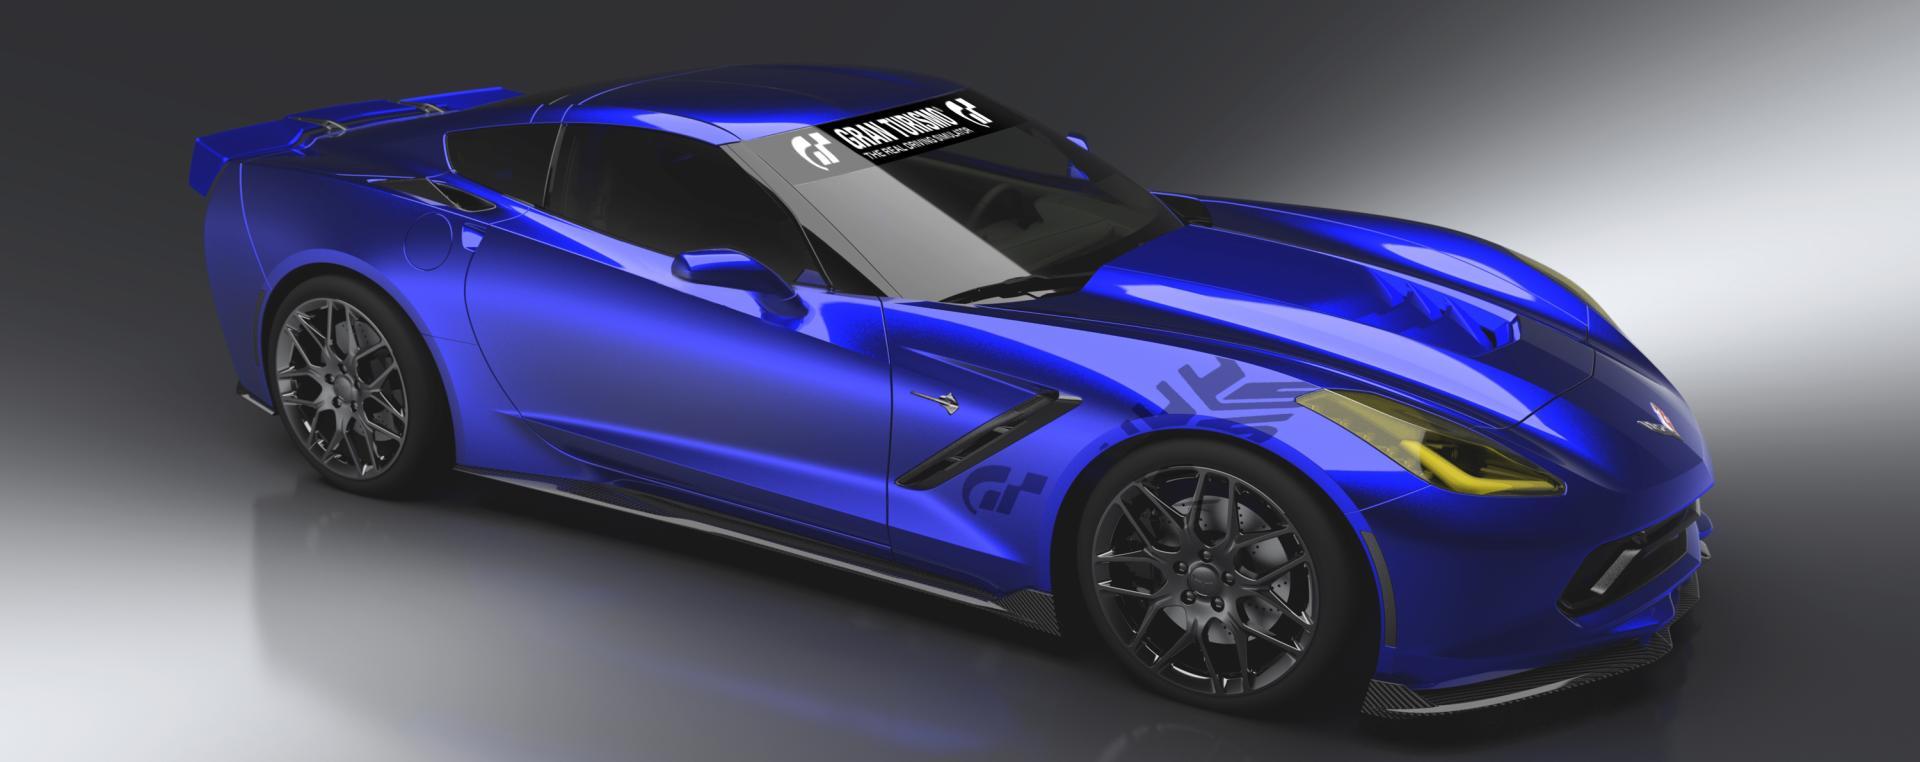 2013 Chevrolet Corvette Stingray Gran Turismo Concept News ...